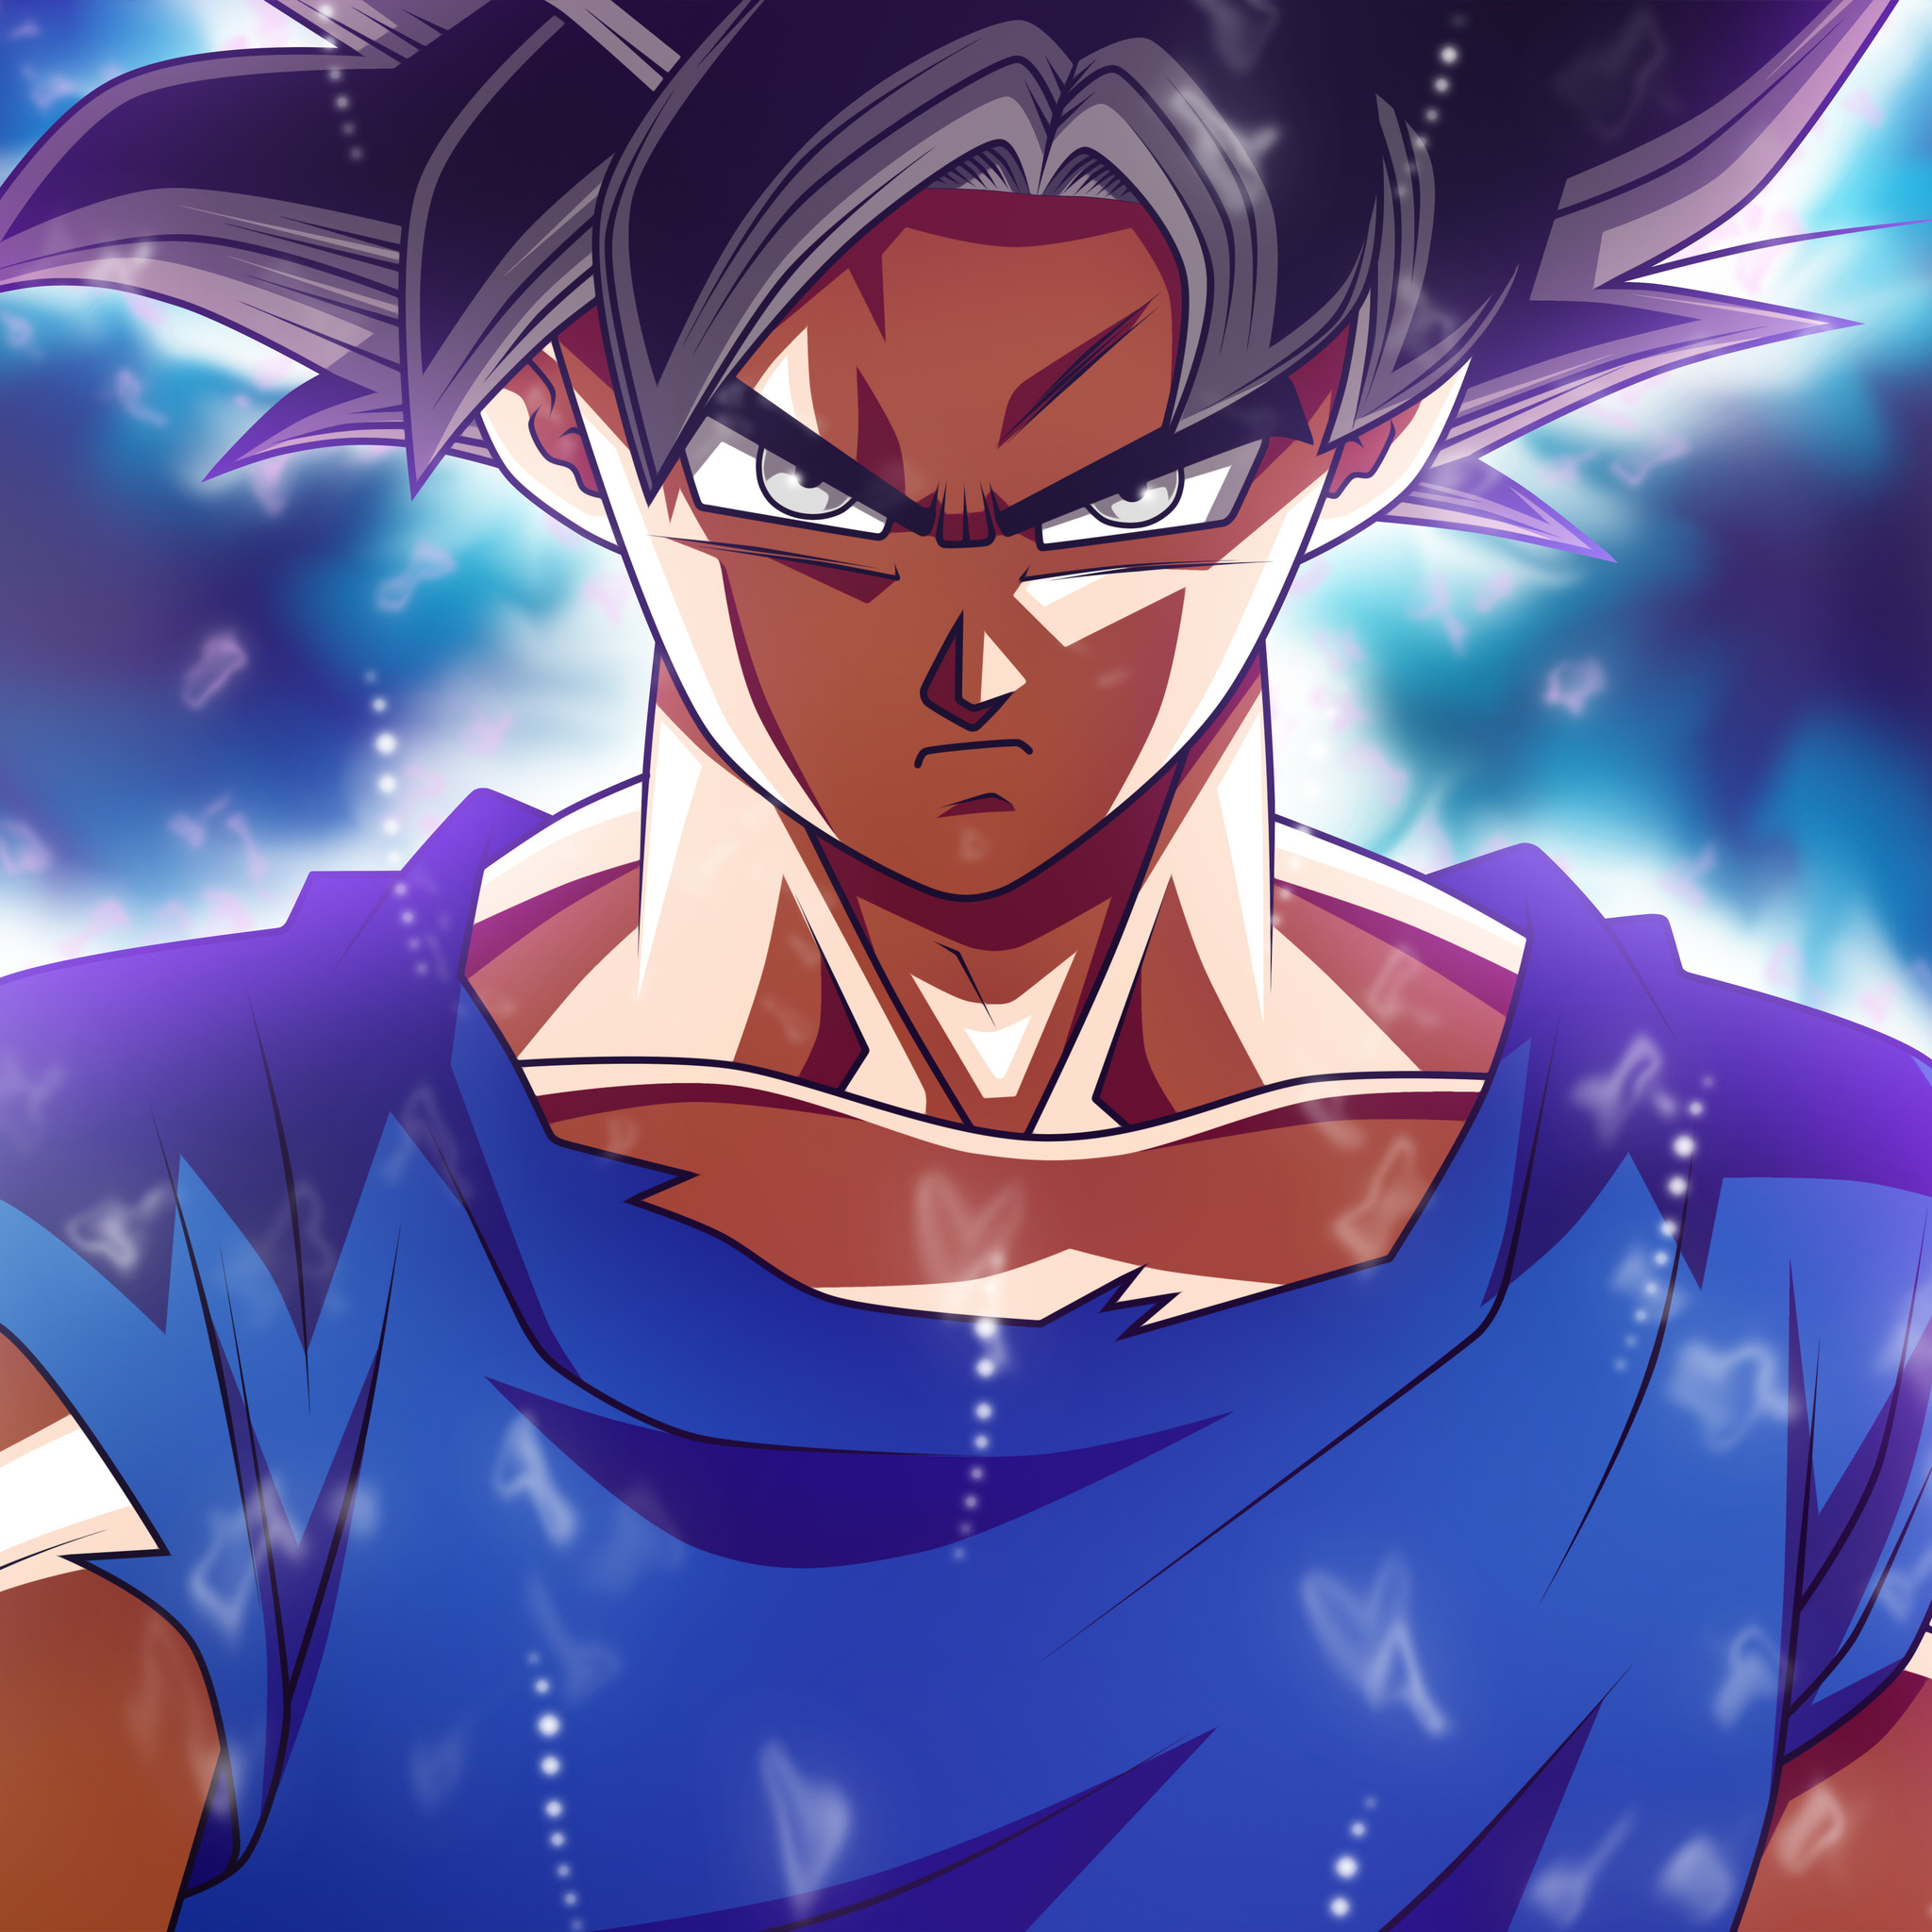 2048x2048 Goku Dragon Ball Super 5k 2017 Ipad Air HD 4k ...